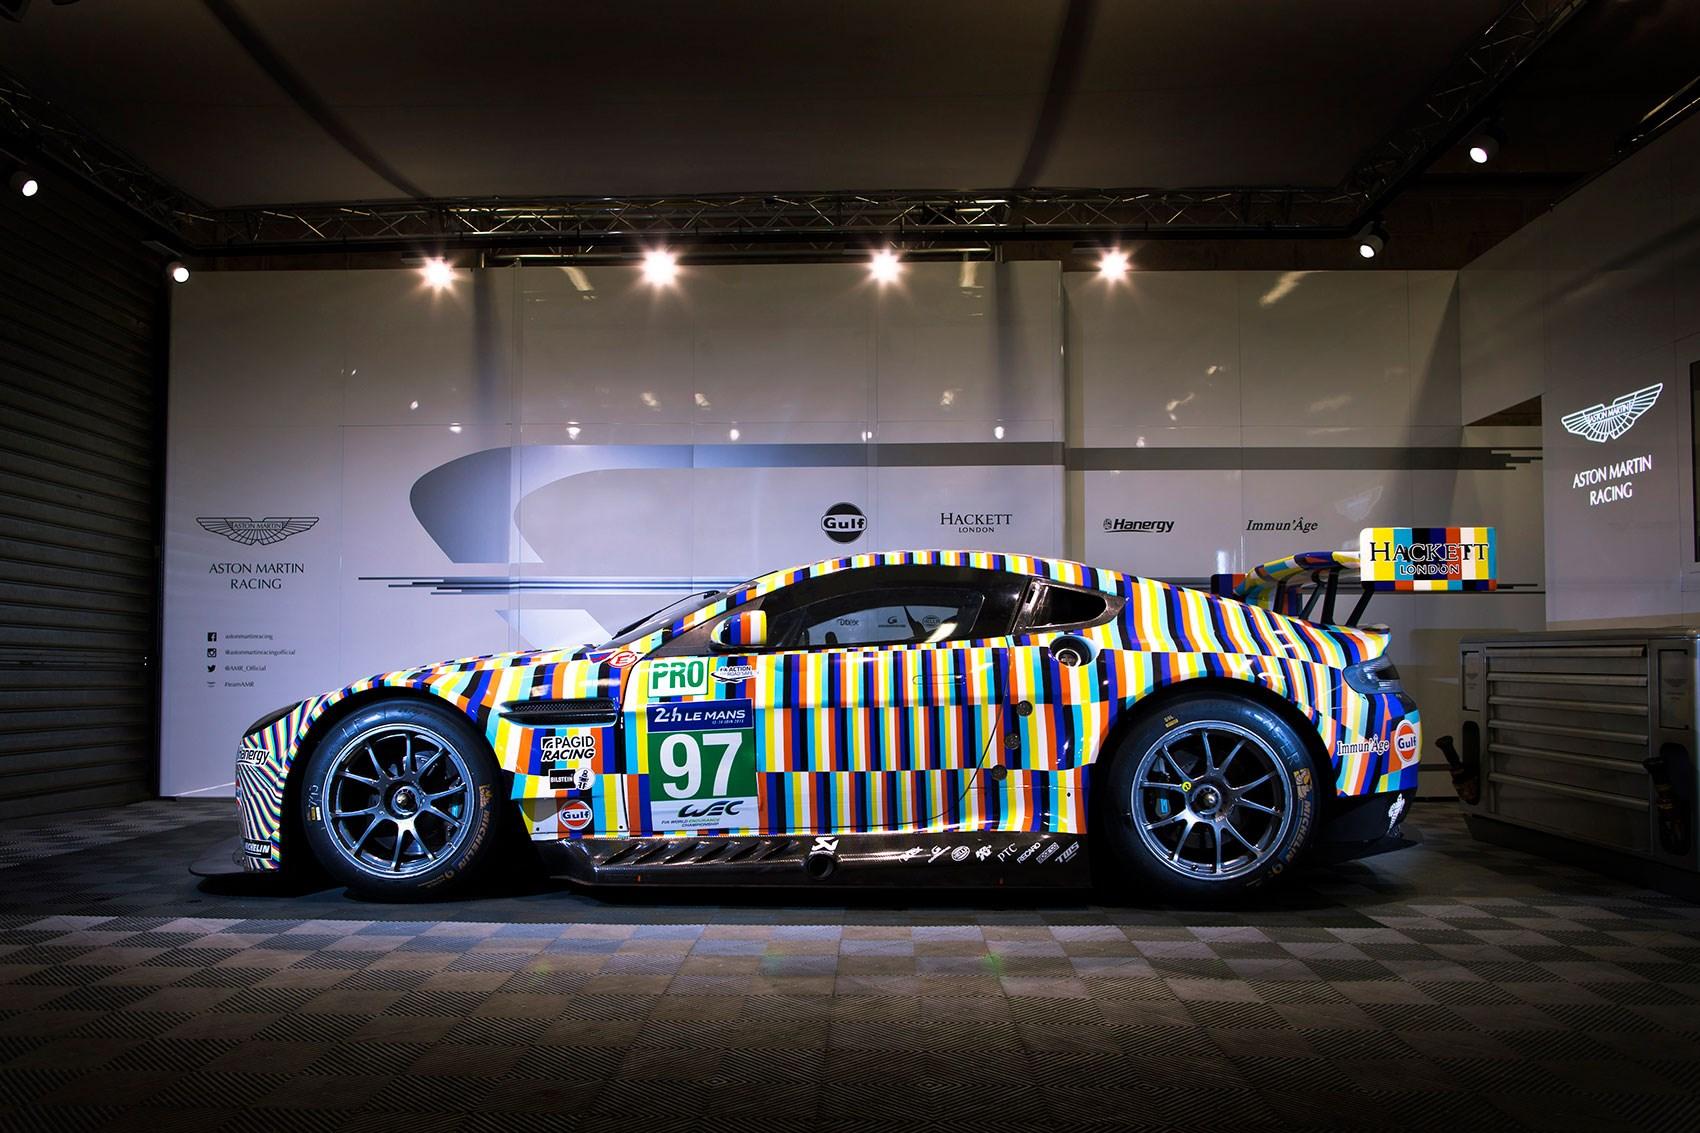 Charming The Tobias Rehberger Designed Aston Martin Art Car ...